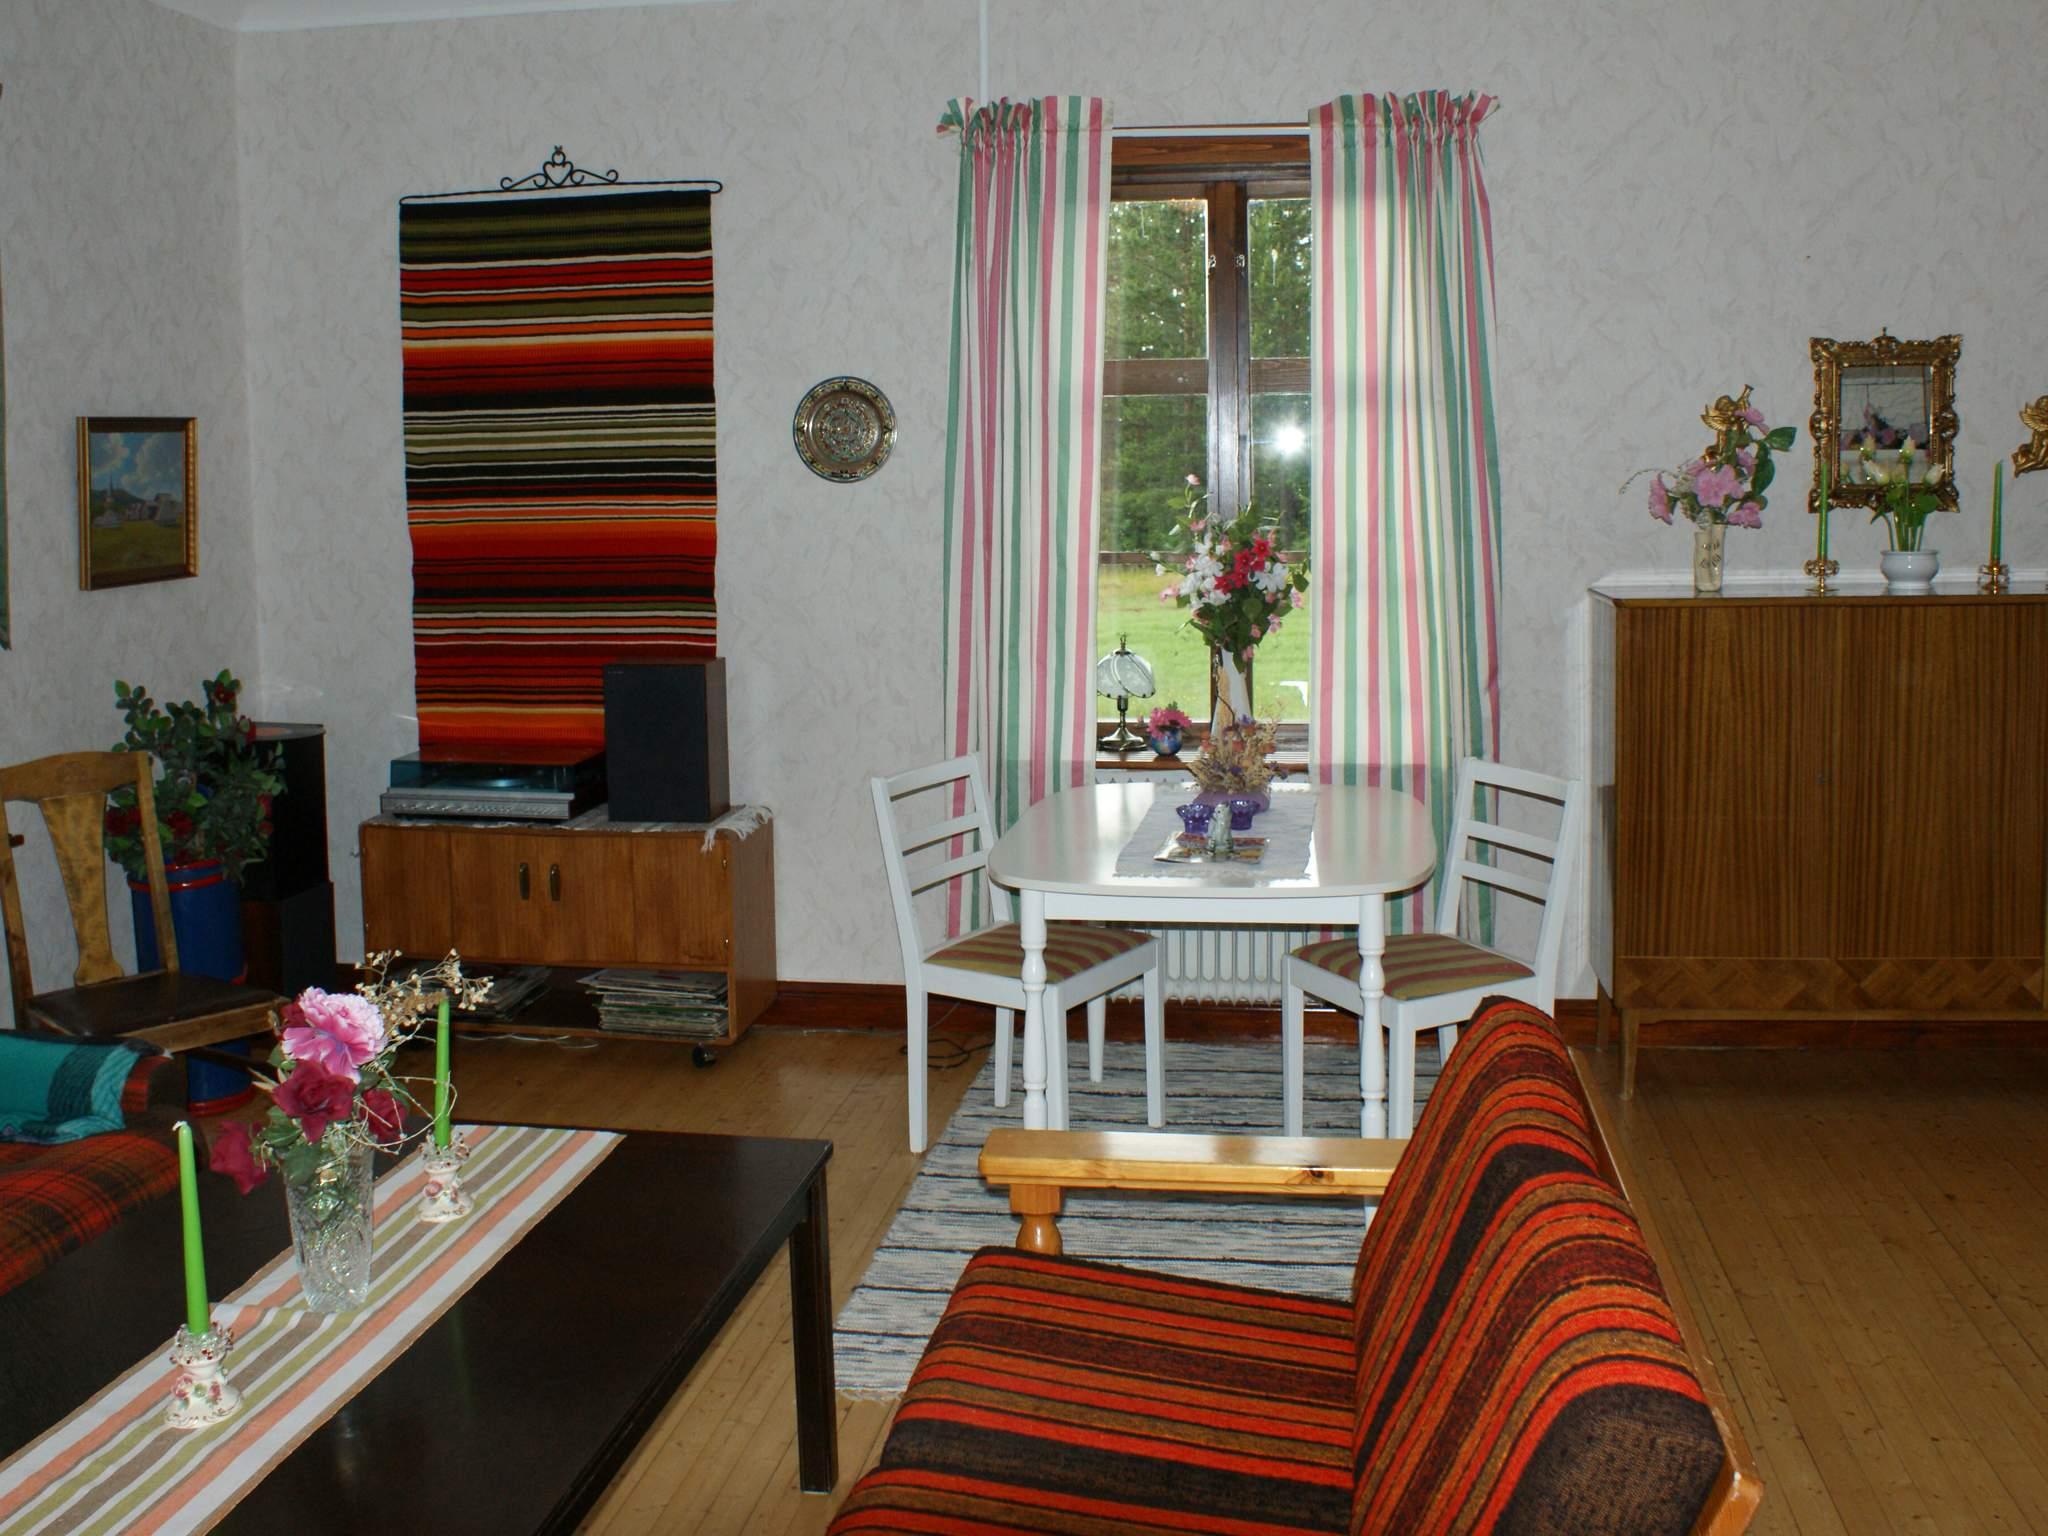 Ferienhaus Nya Skaraborg (460955), Abborrträsk, Norrbottens län, Nordschweden, Schweden, Bild 3